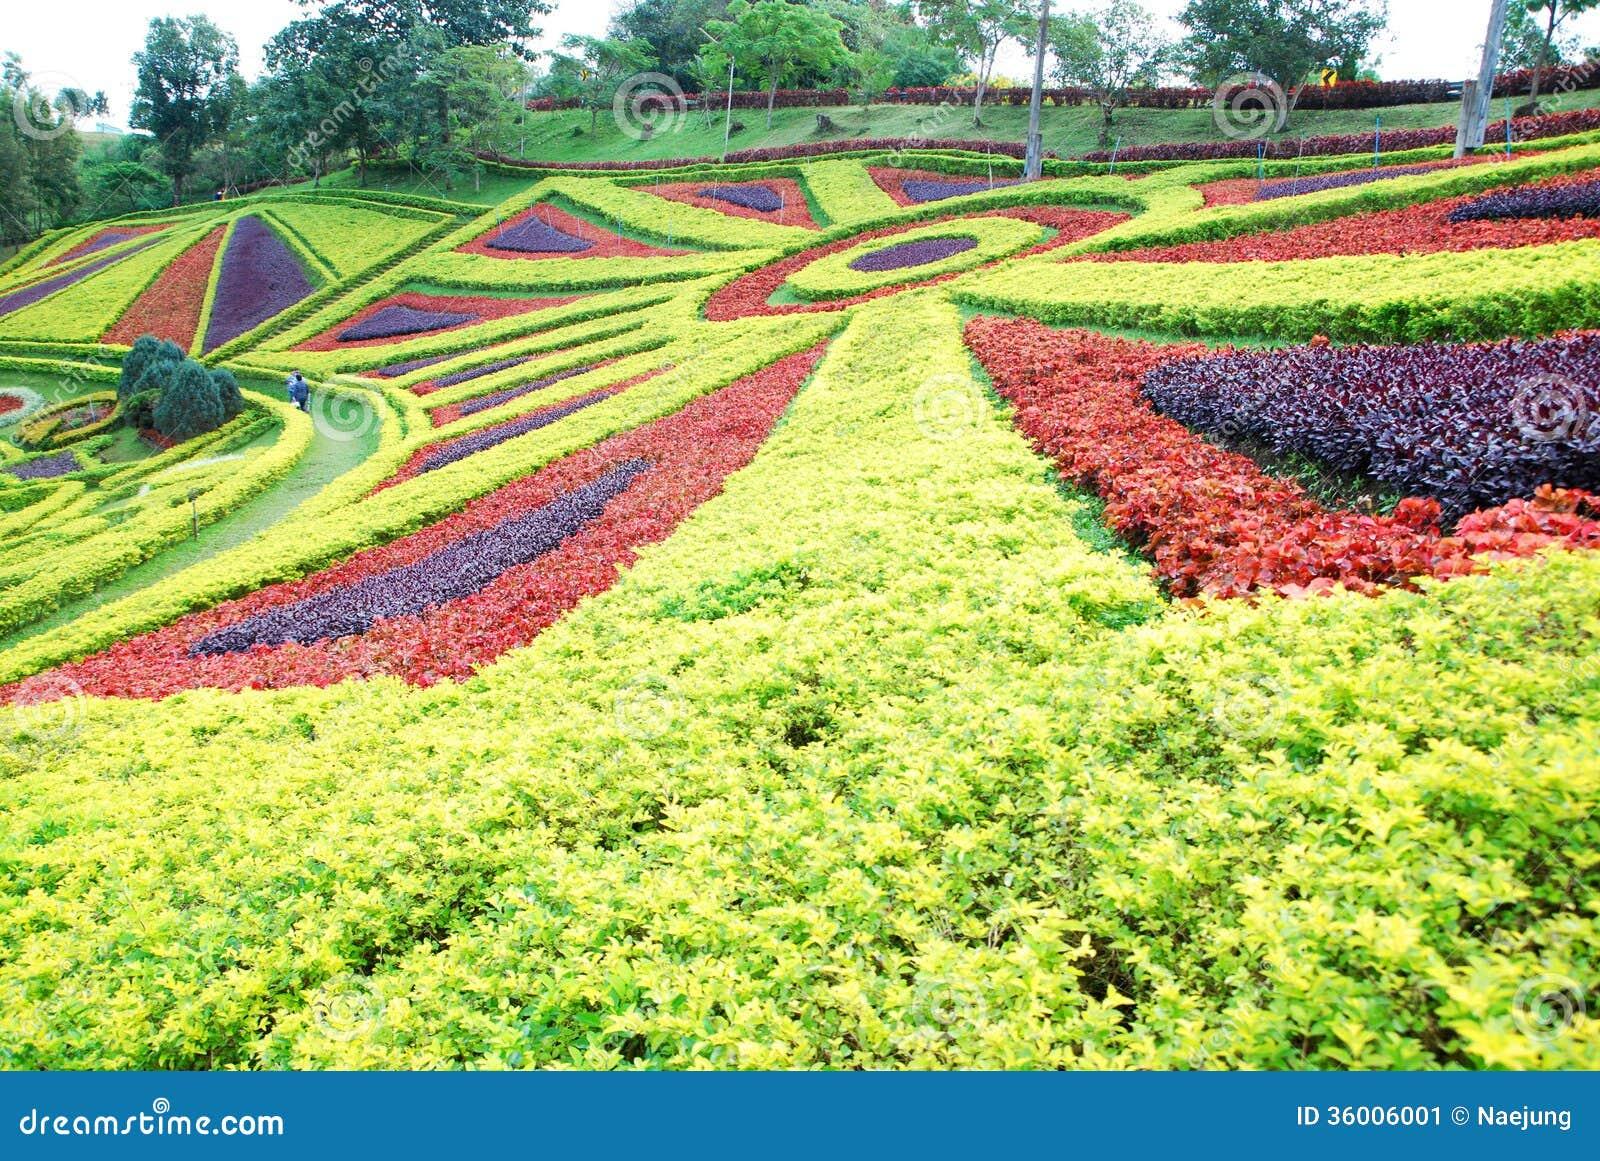 Ornamental garden stock image image of flowerbed house for Ornamental garden